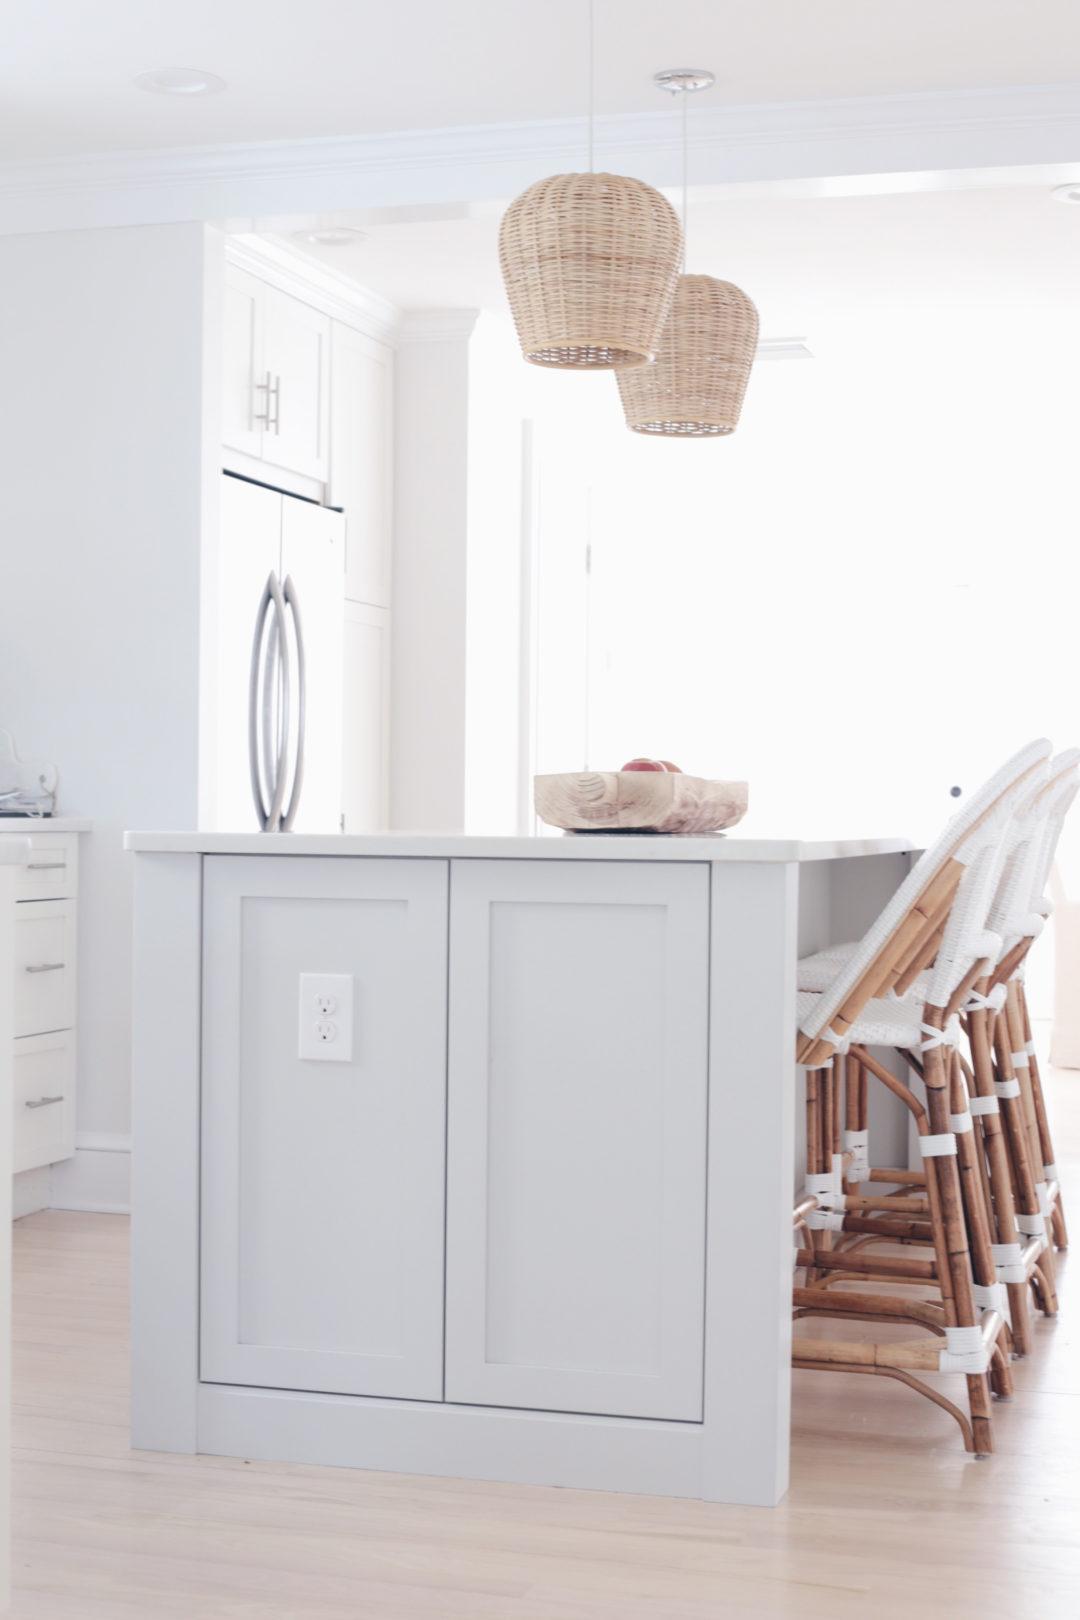 MUST READ - Number 1 tip when planning a kitchen renovation - kitchen island design